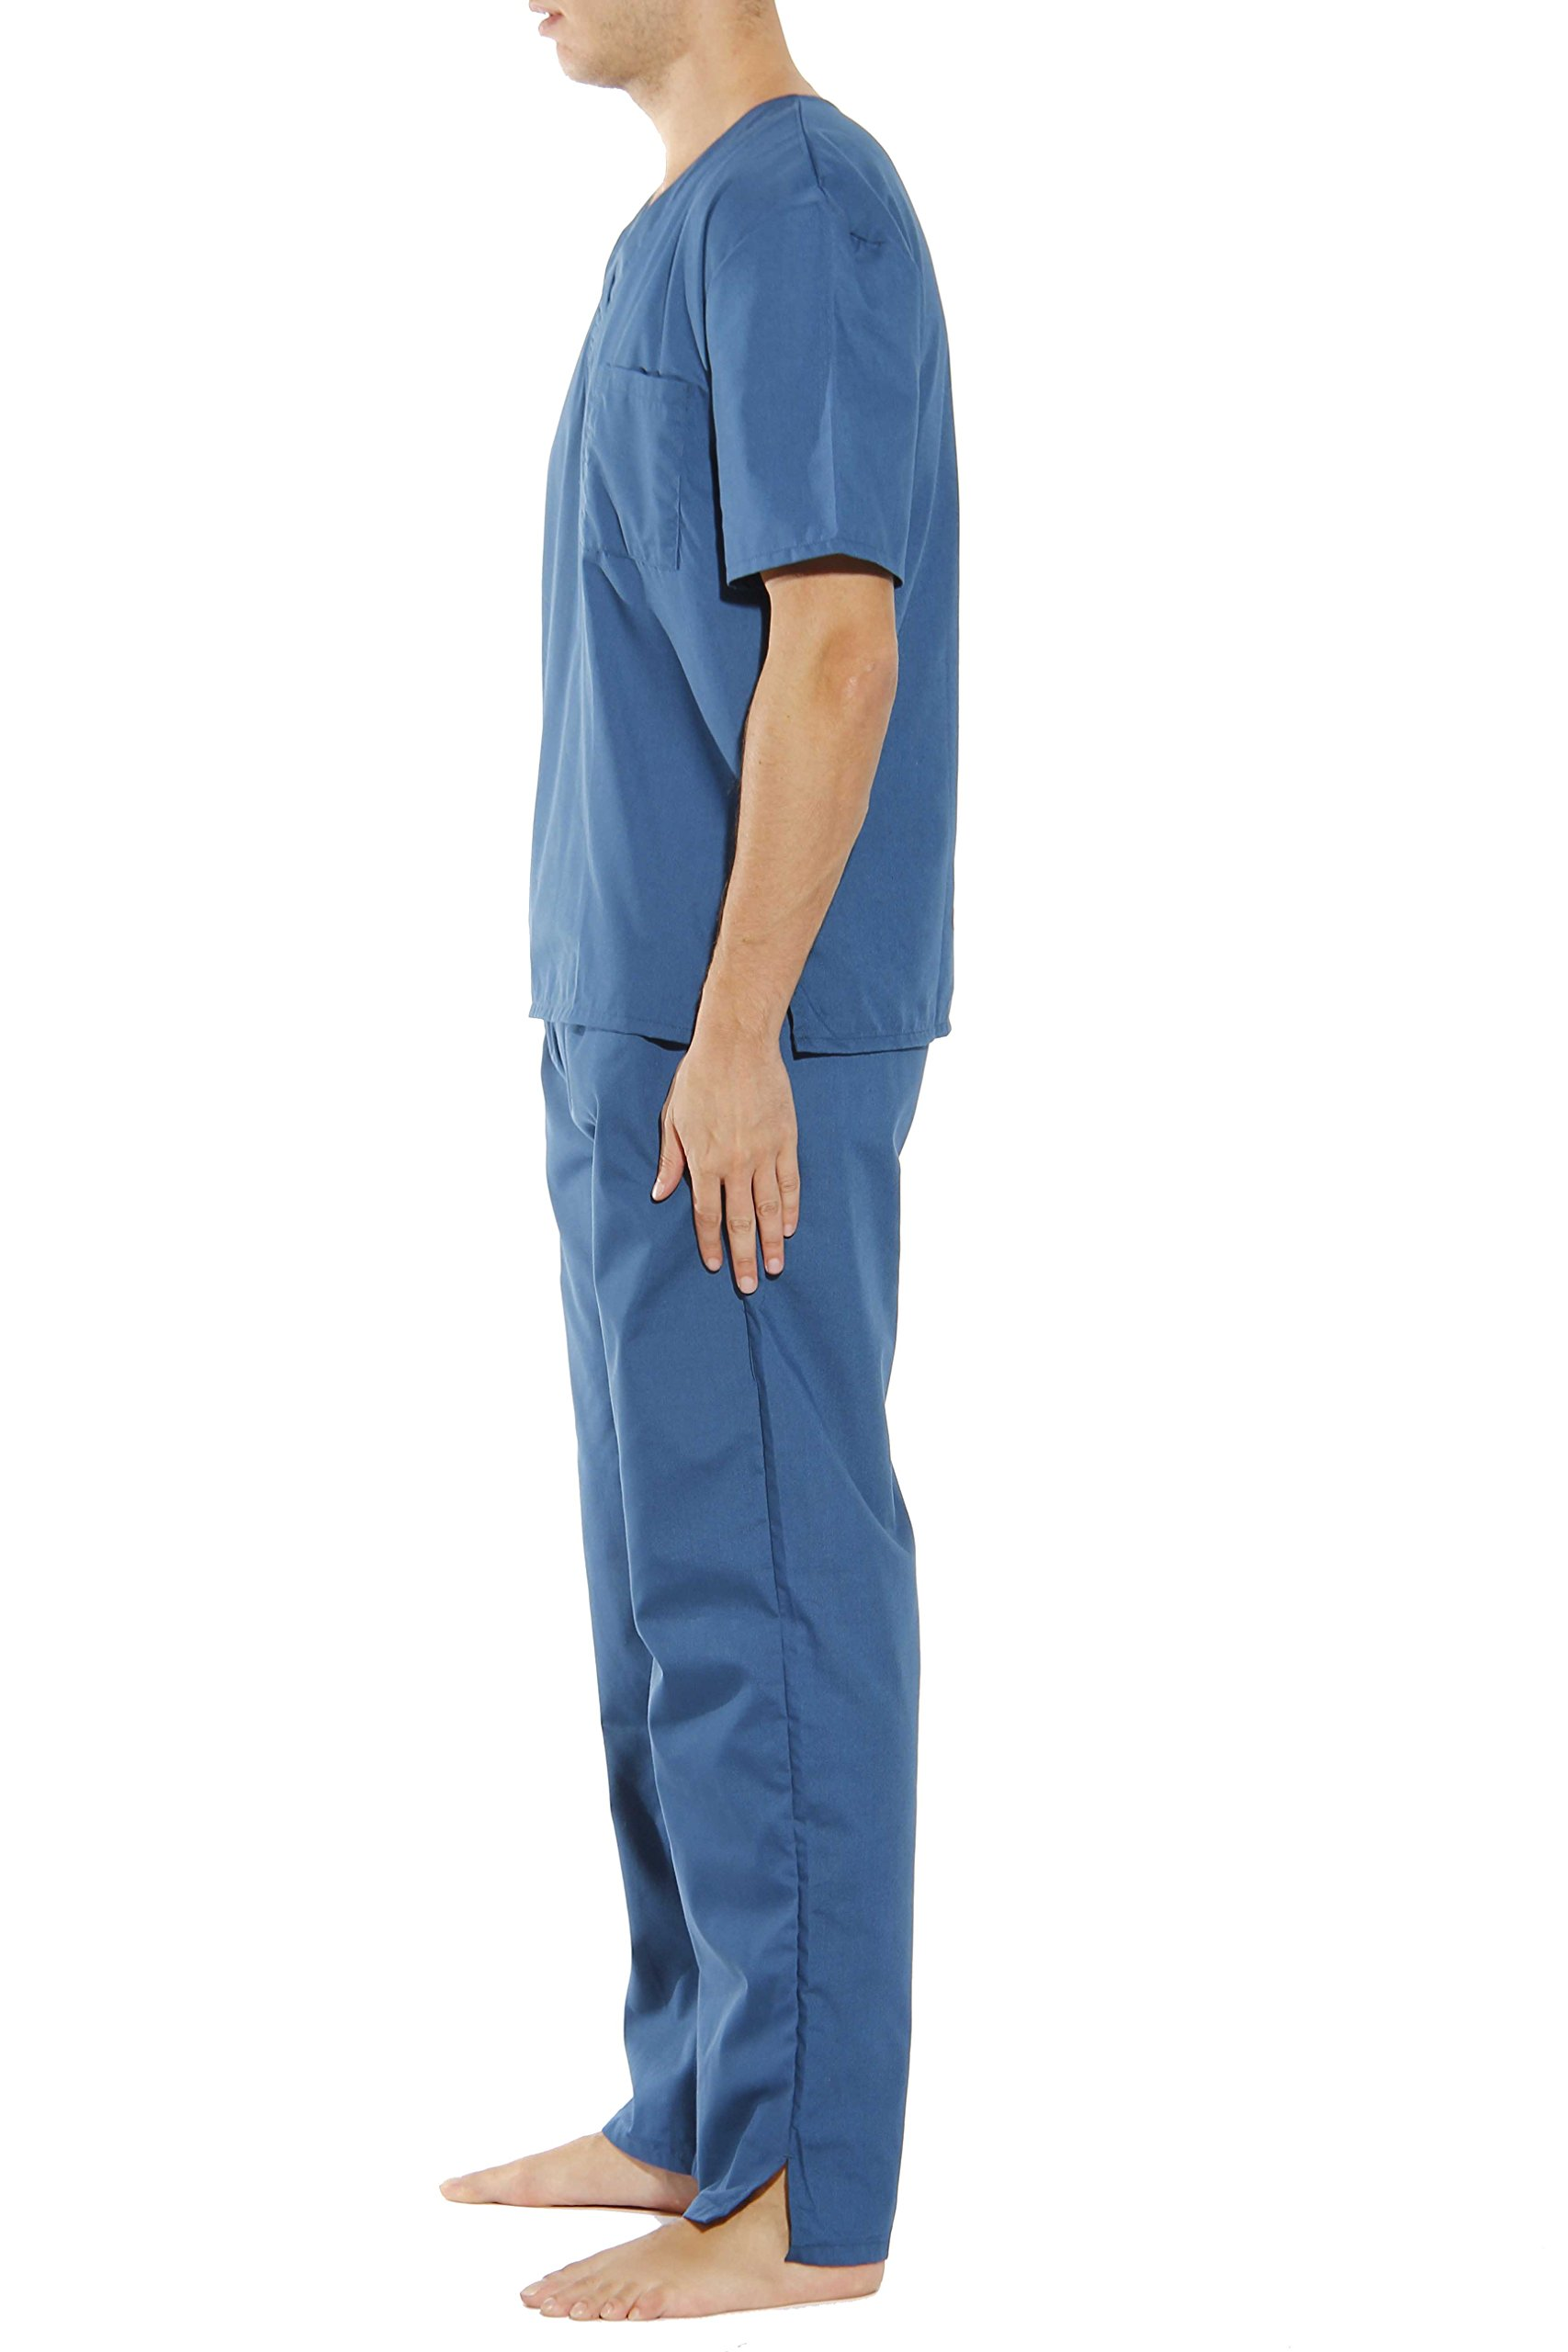 33000M-Carribean Blue-M Tropi Unisex Scrub Sets / Medical Scrubs / Nursing Scrubs by Tropi (Image #2)